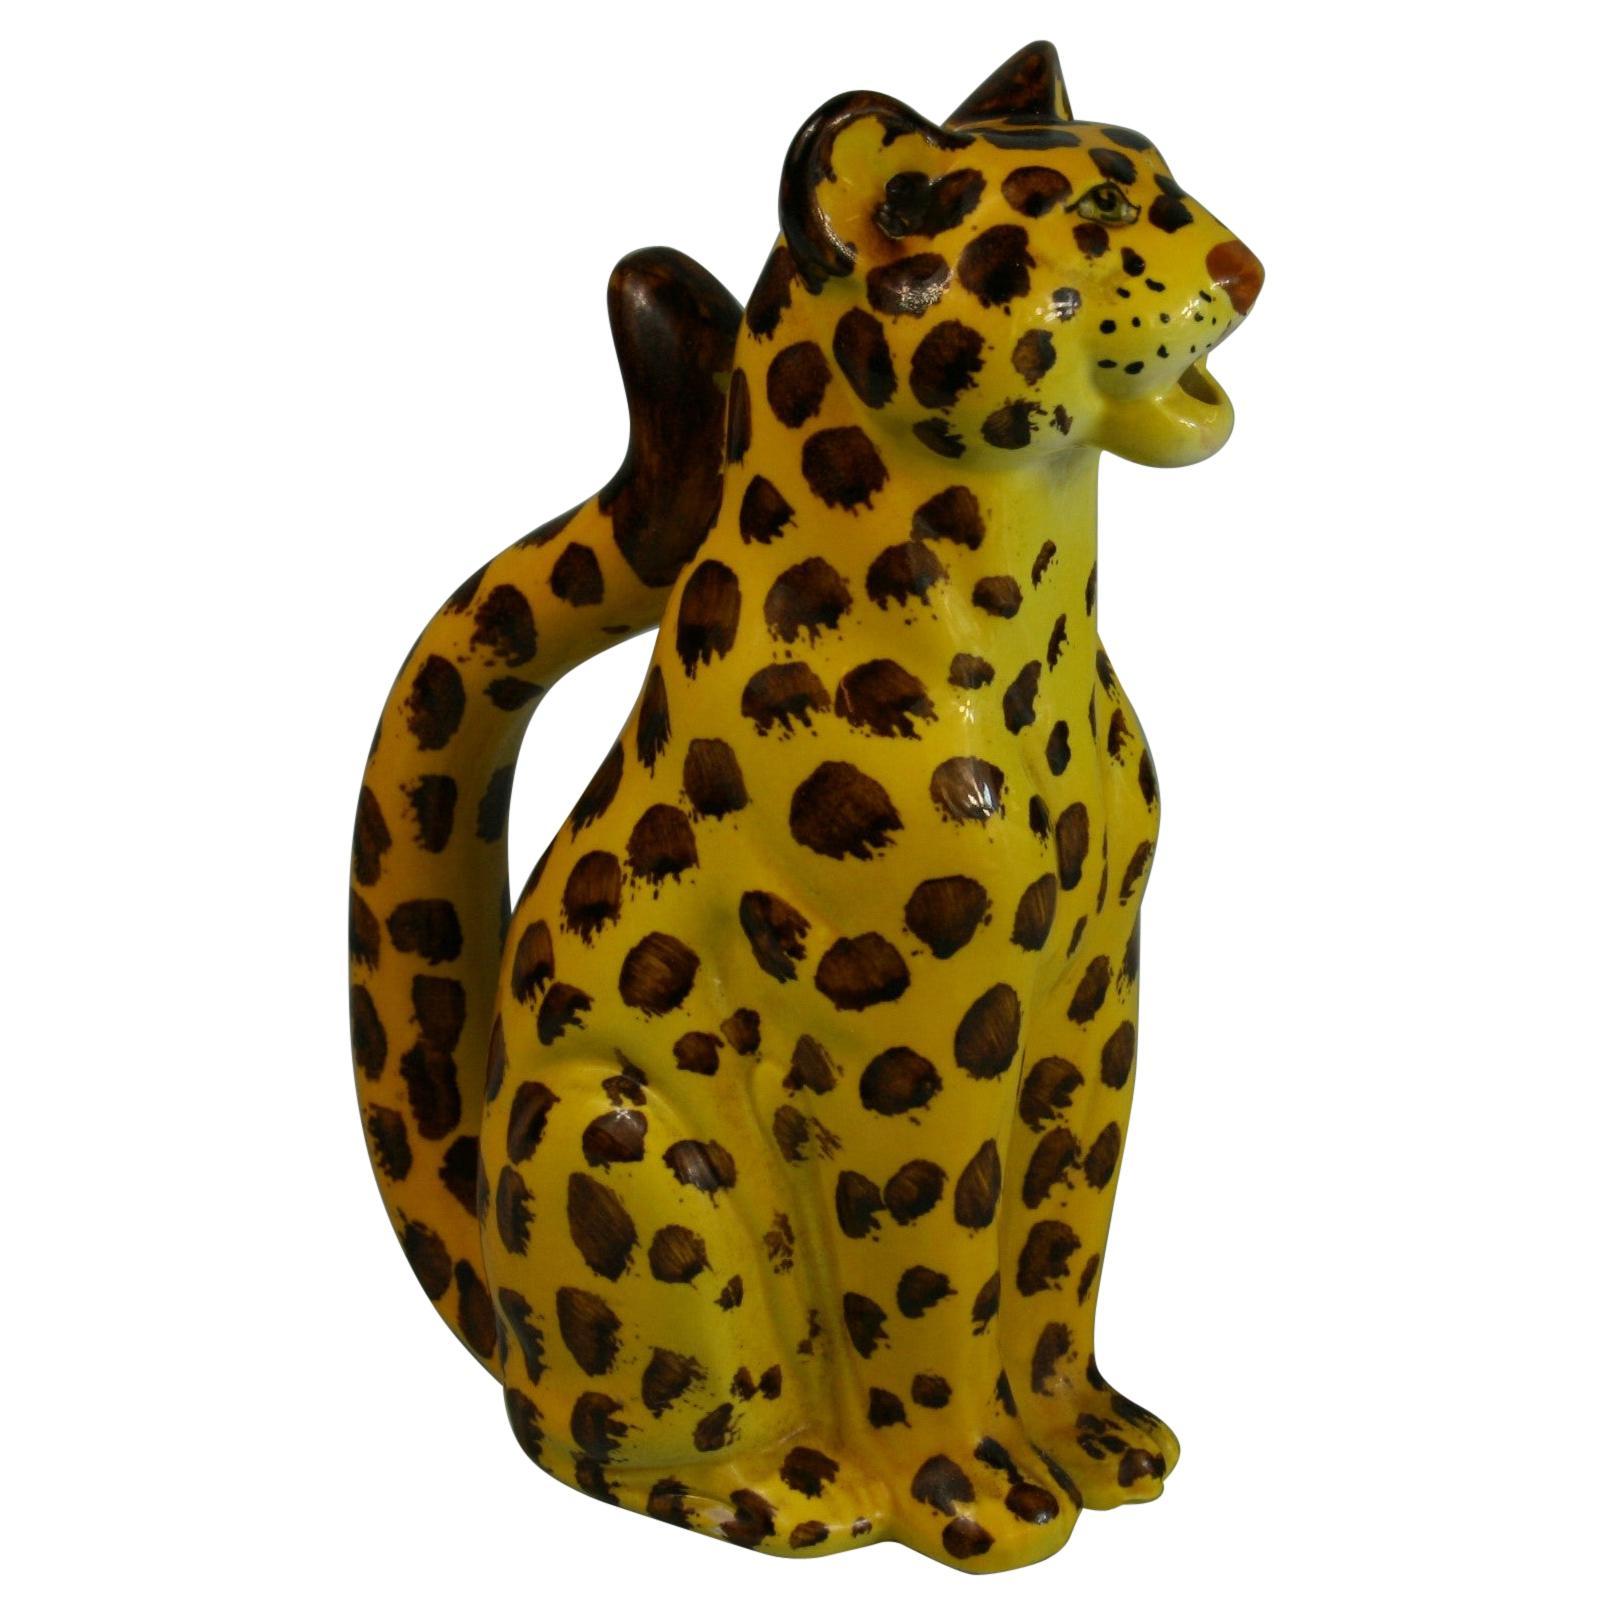 Italian Hand Painted Ceramic Cheetah Sculpture/Pitcher, 1970's